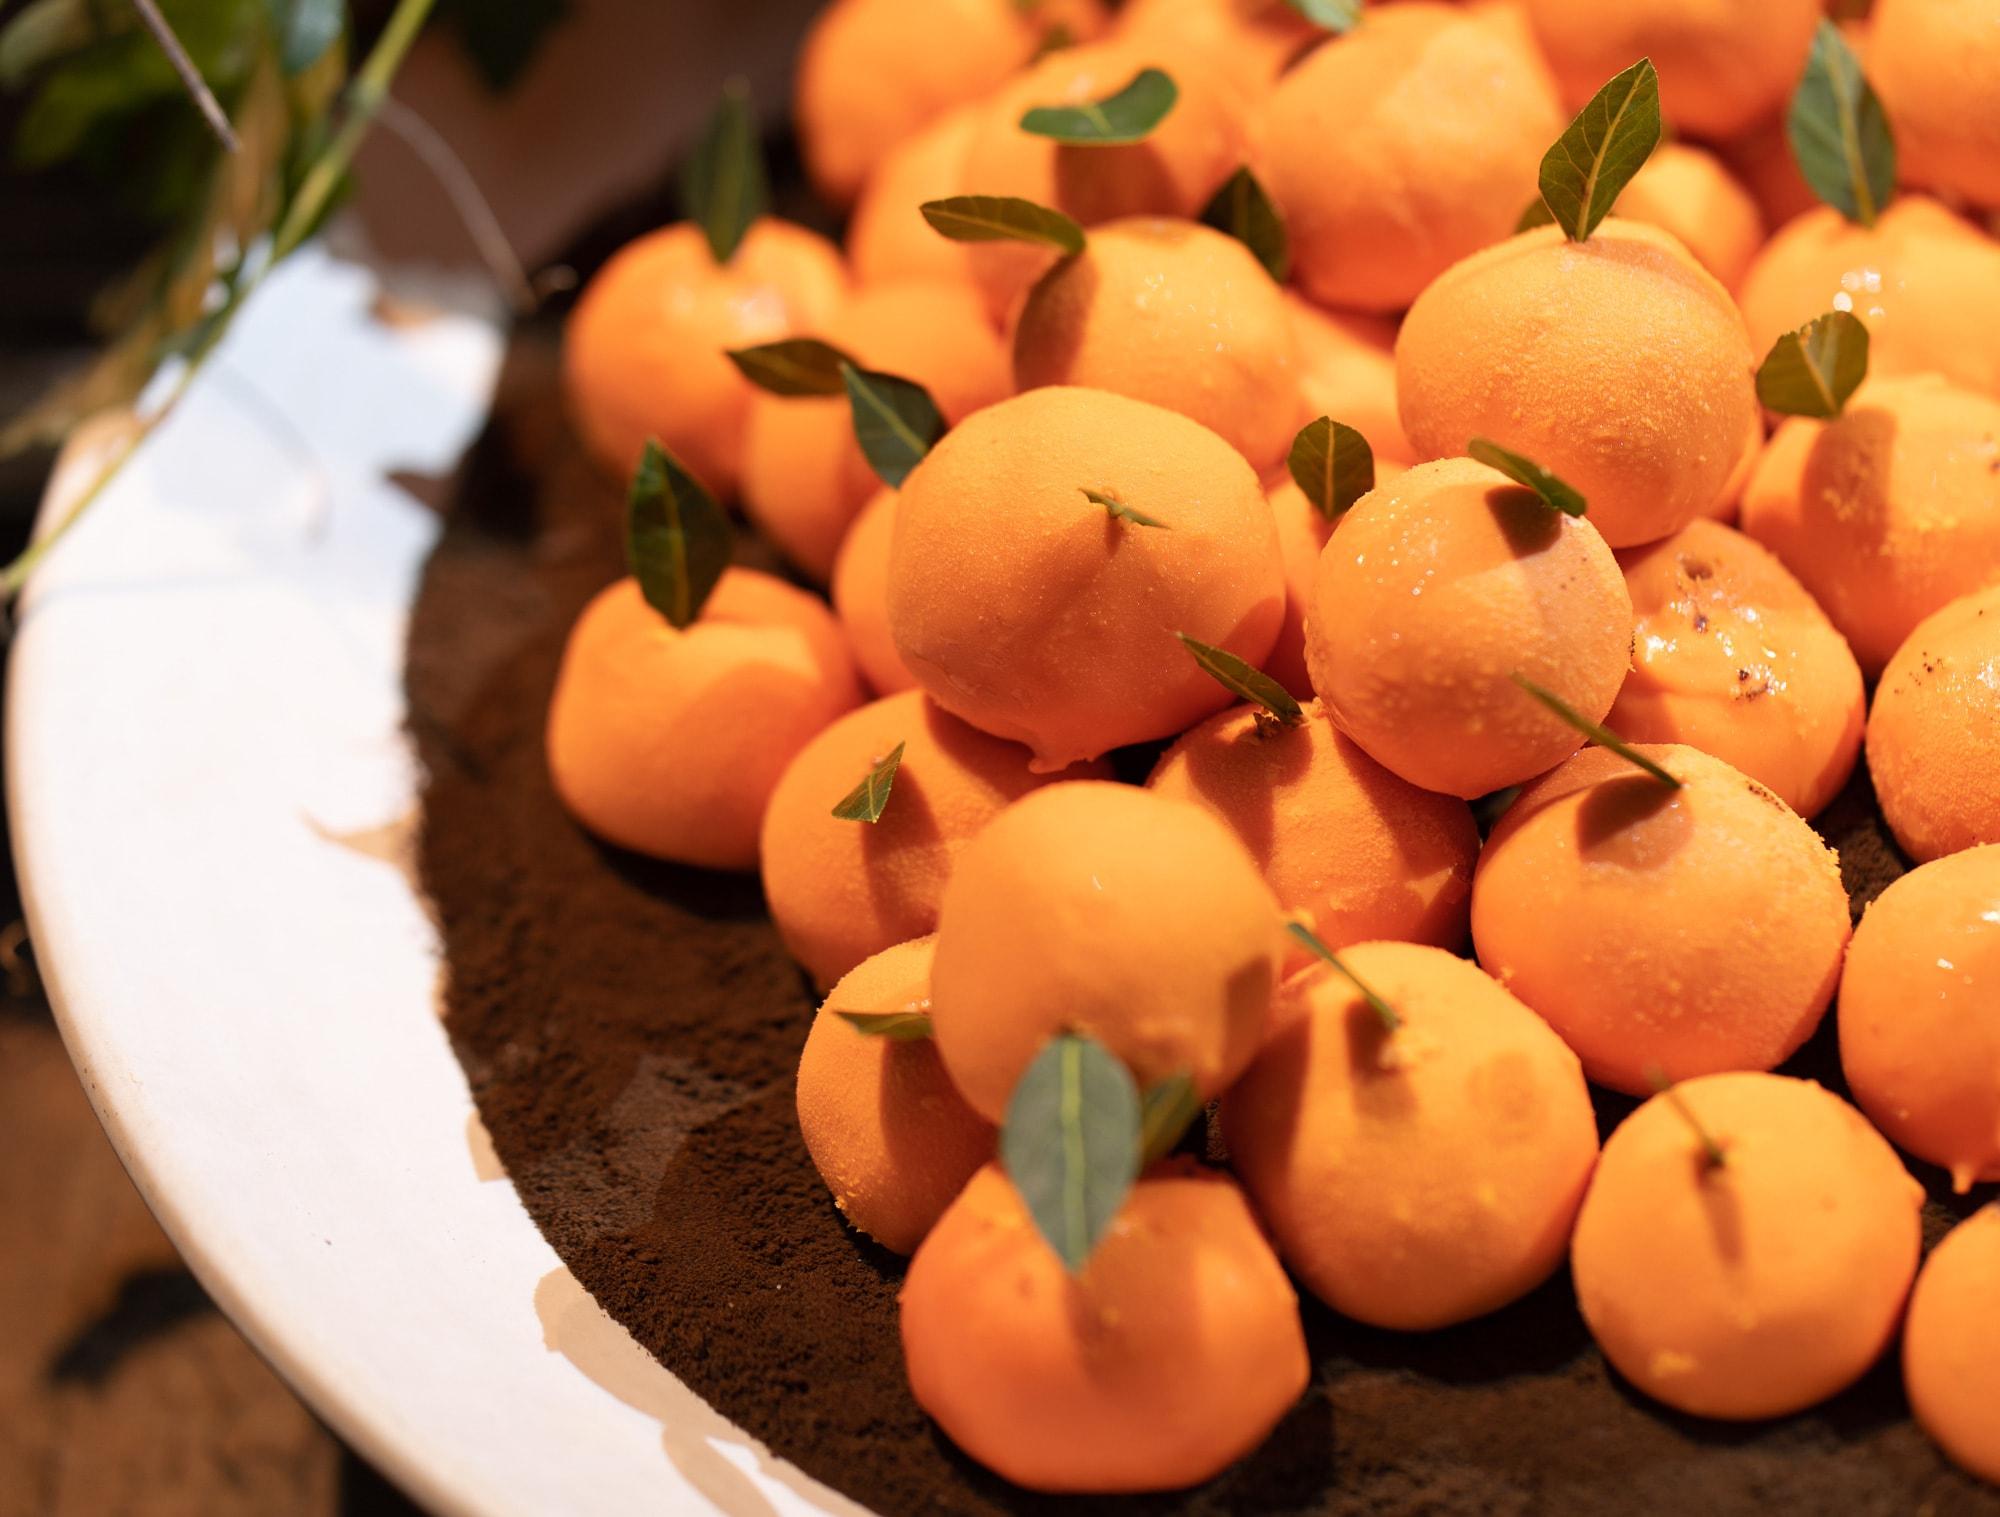 Mousse de laranja  com chocolate amargo e crumble de chocolate